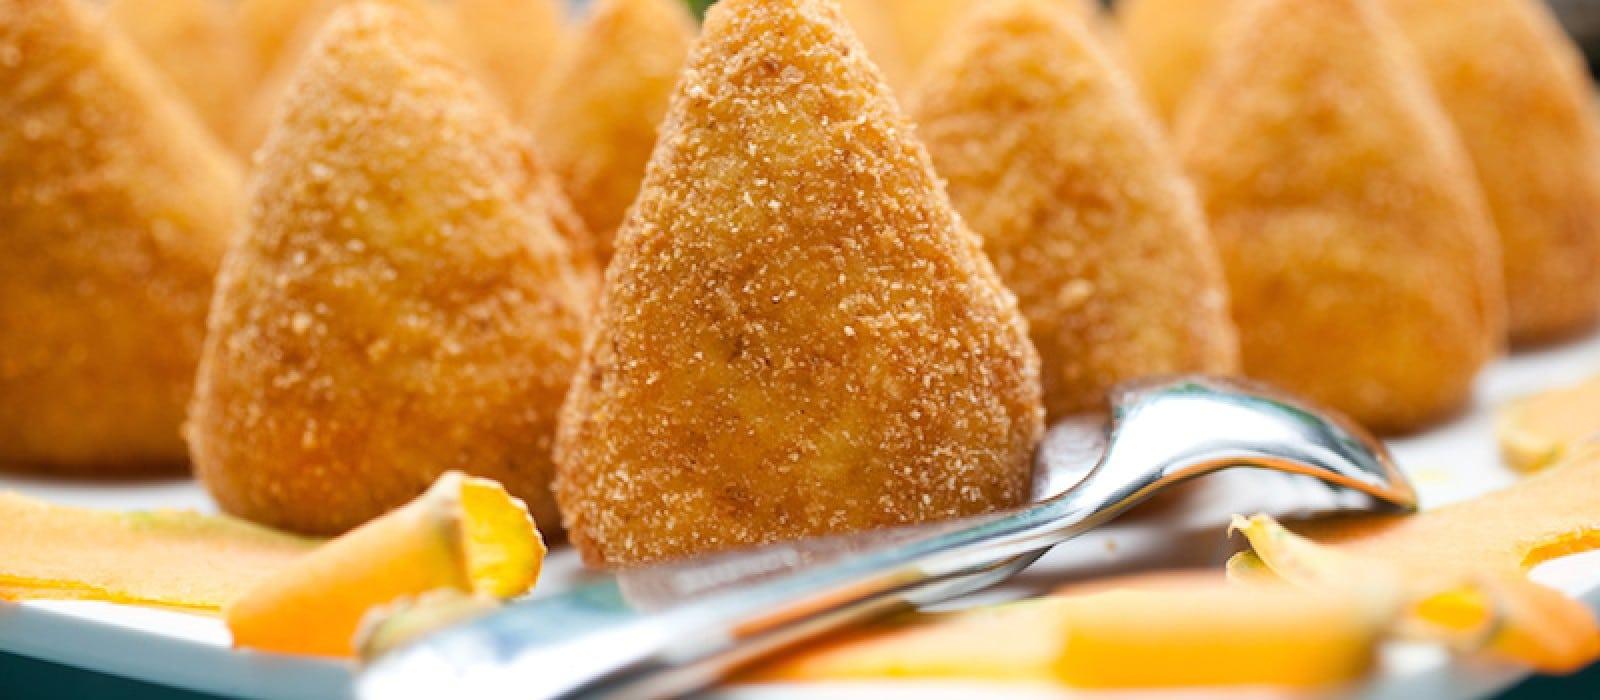 Categoria: Уроки итальянской кухни